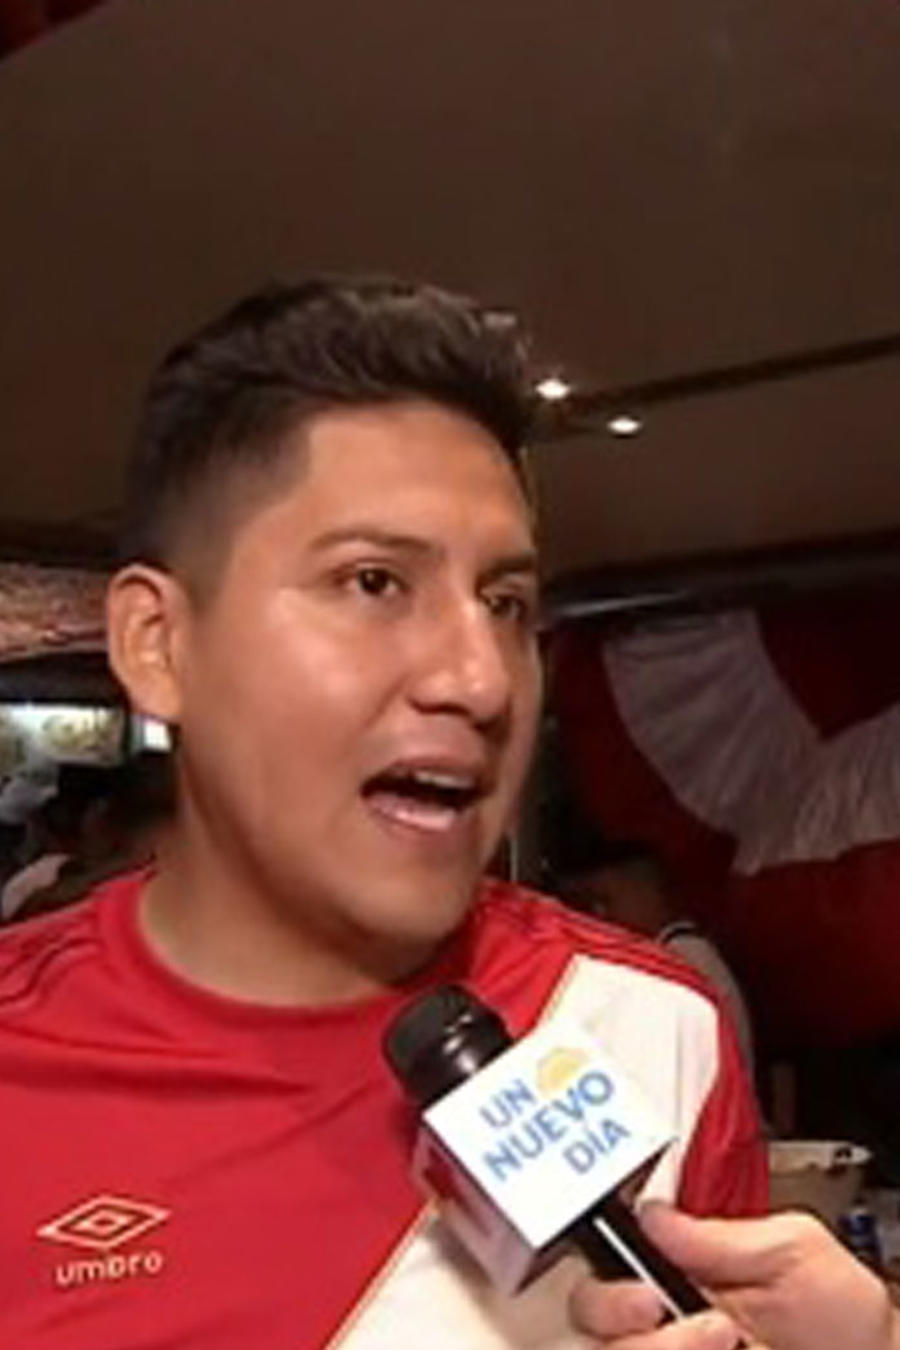 Hinchas de Perú invaden Rio de Janeiro